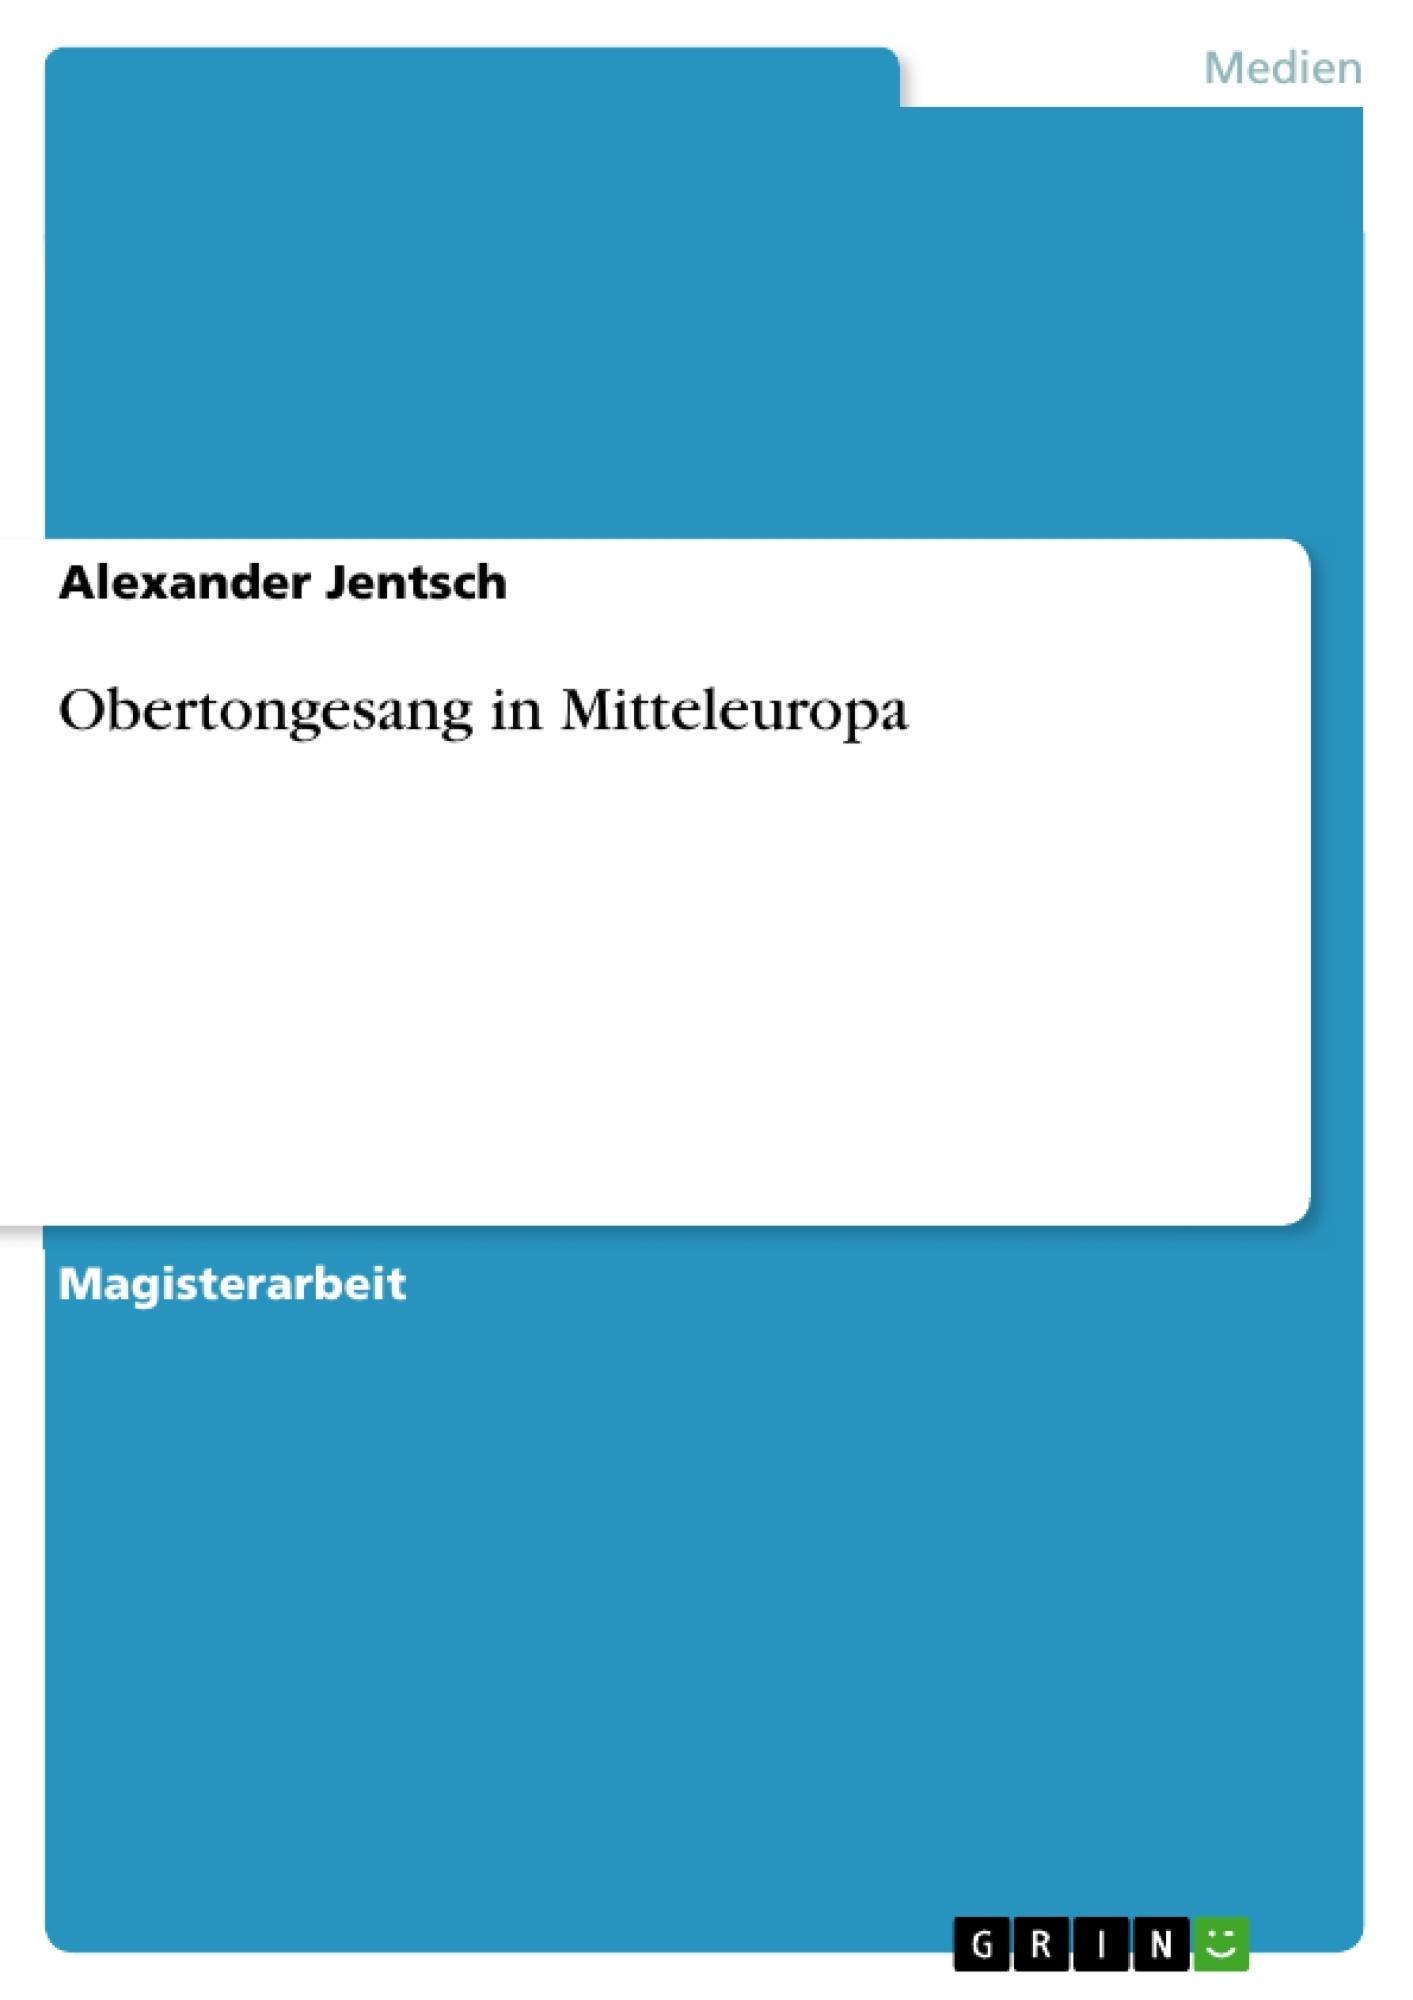 Titel: Obertongesang in Mitteleuropa